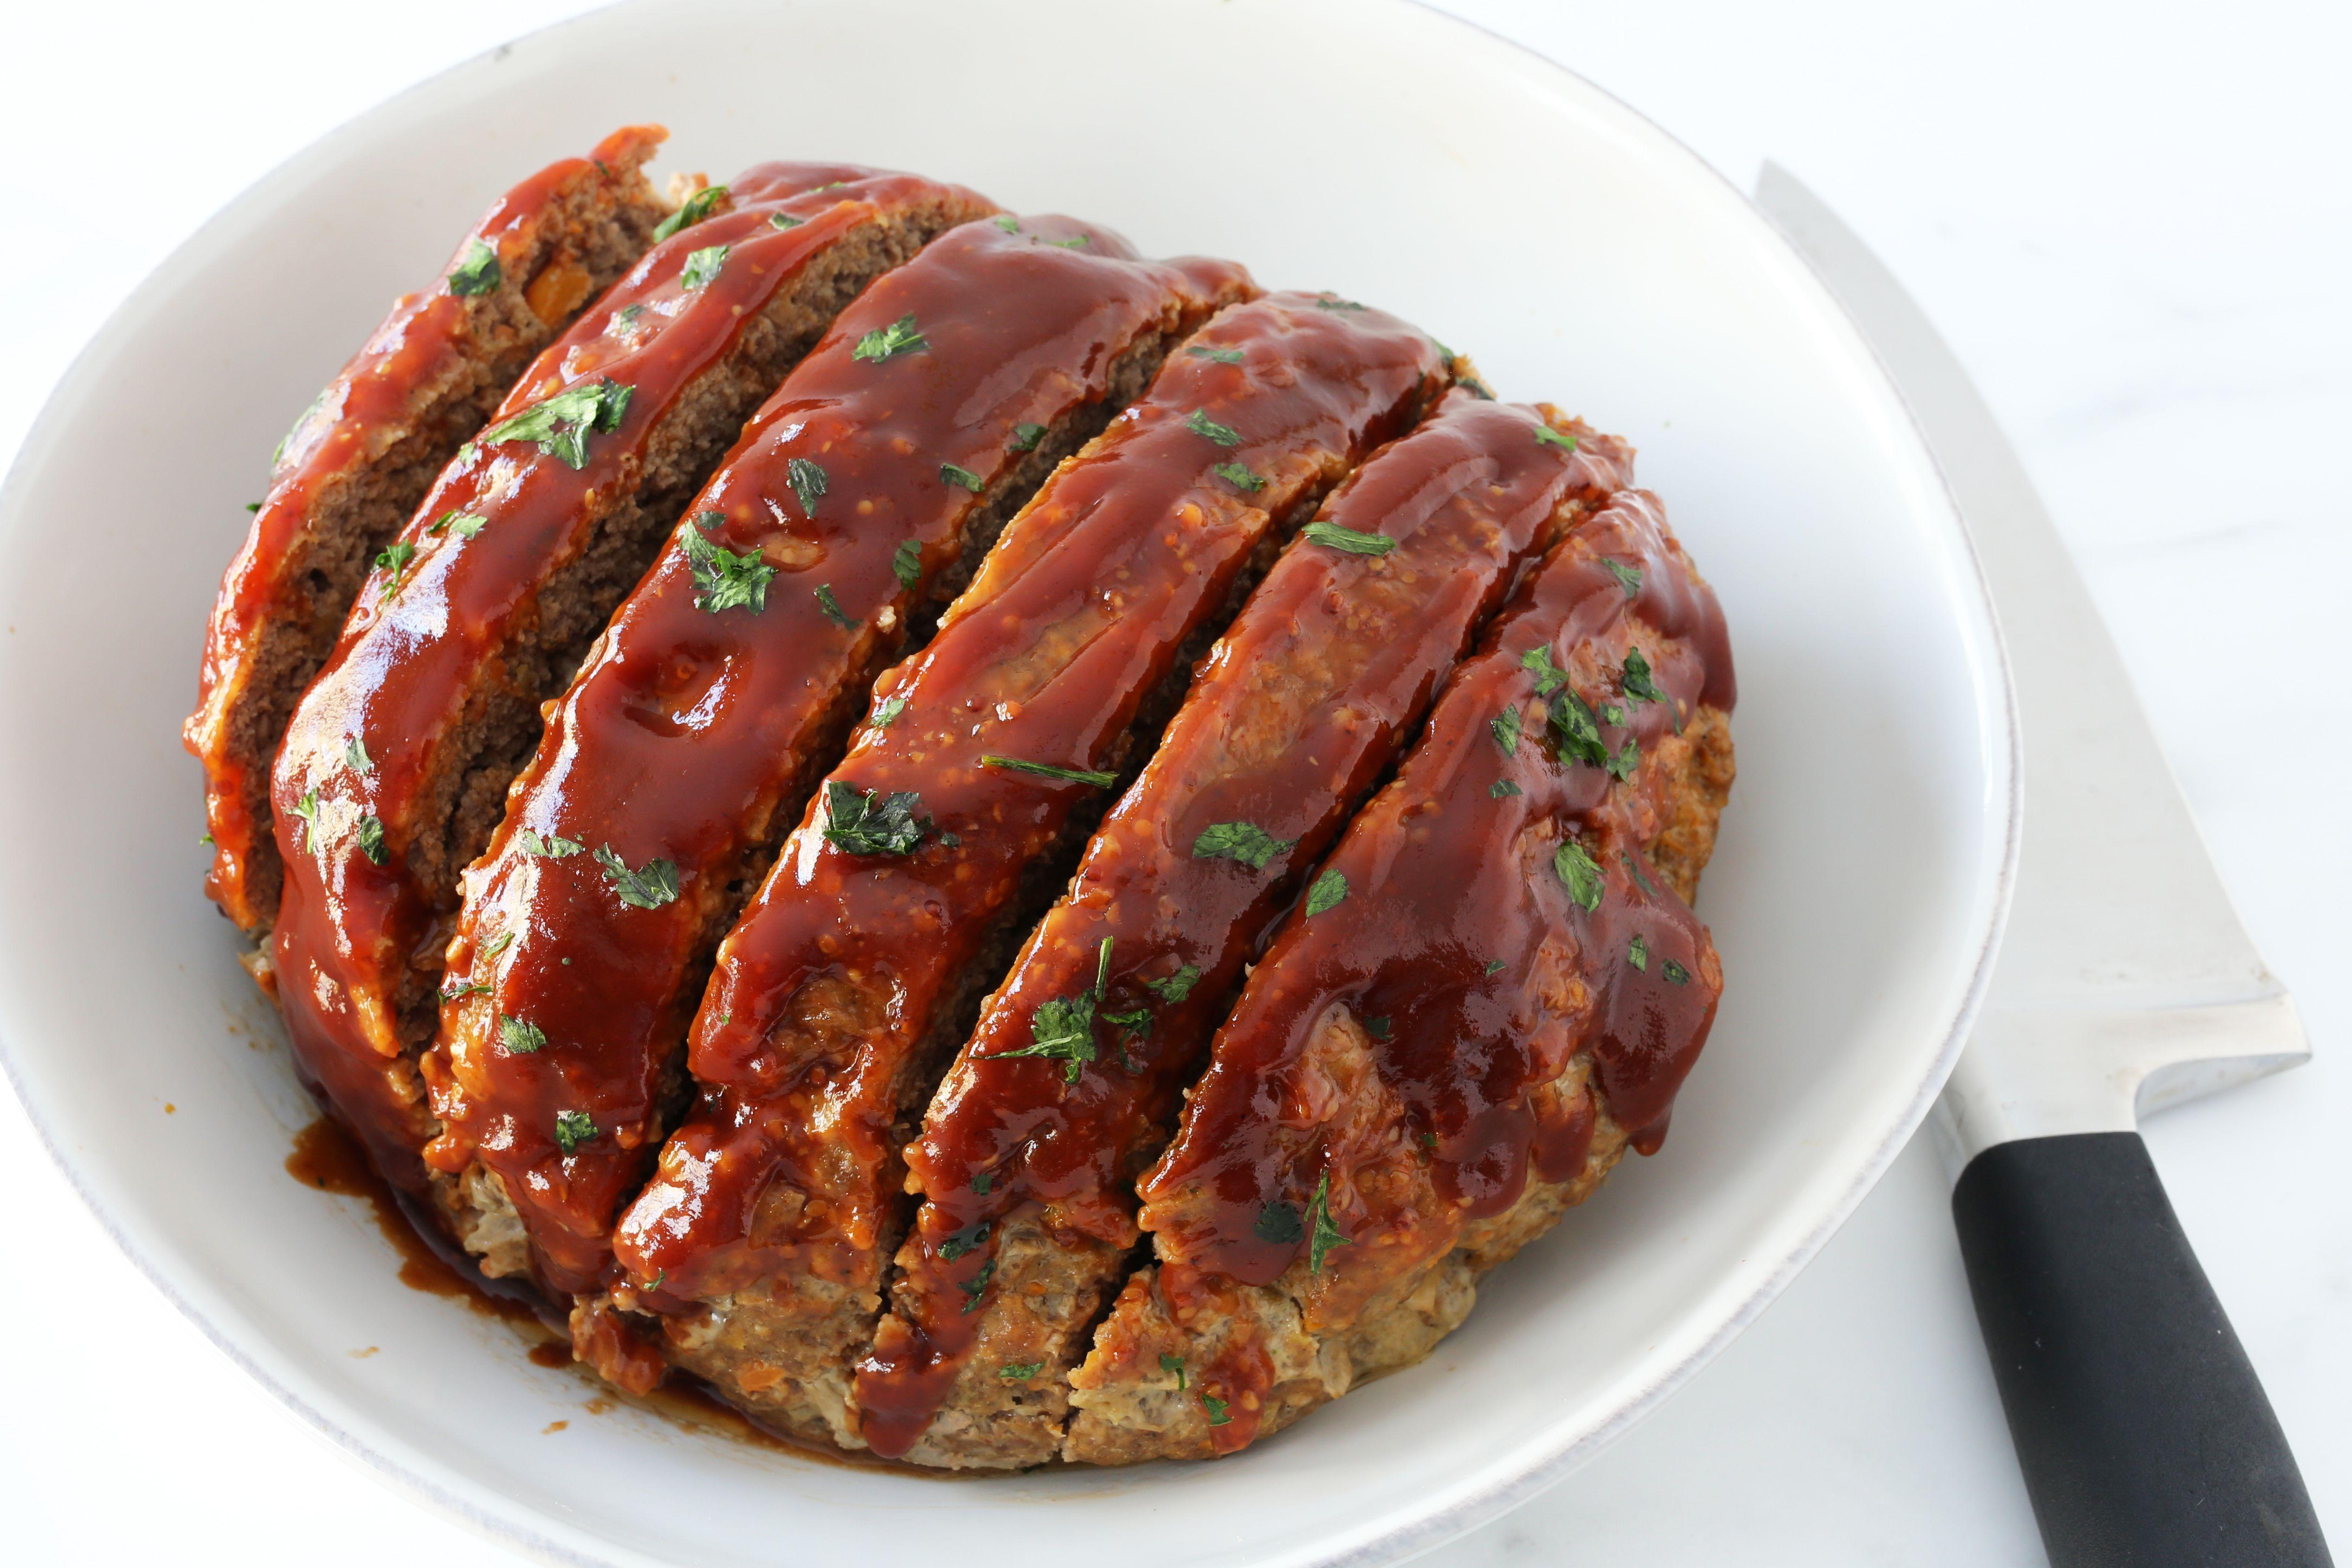 Enjoy An Old Fashioned Instant Pot Meatloaf In Half The Time Recipe Meatloaf Recipes Meatloaf Recipes